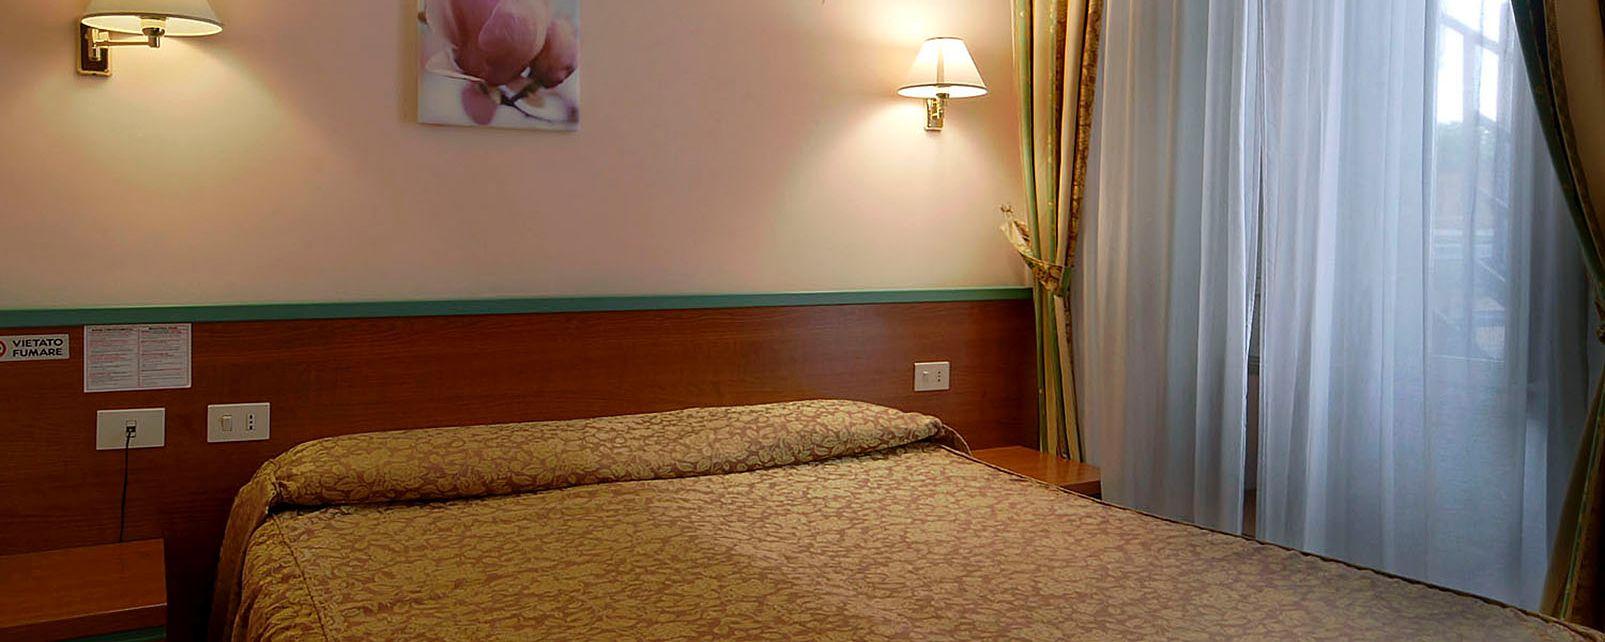 Hotel CENTER 1